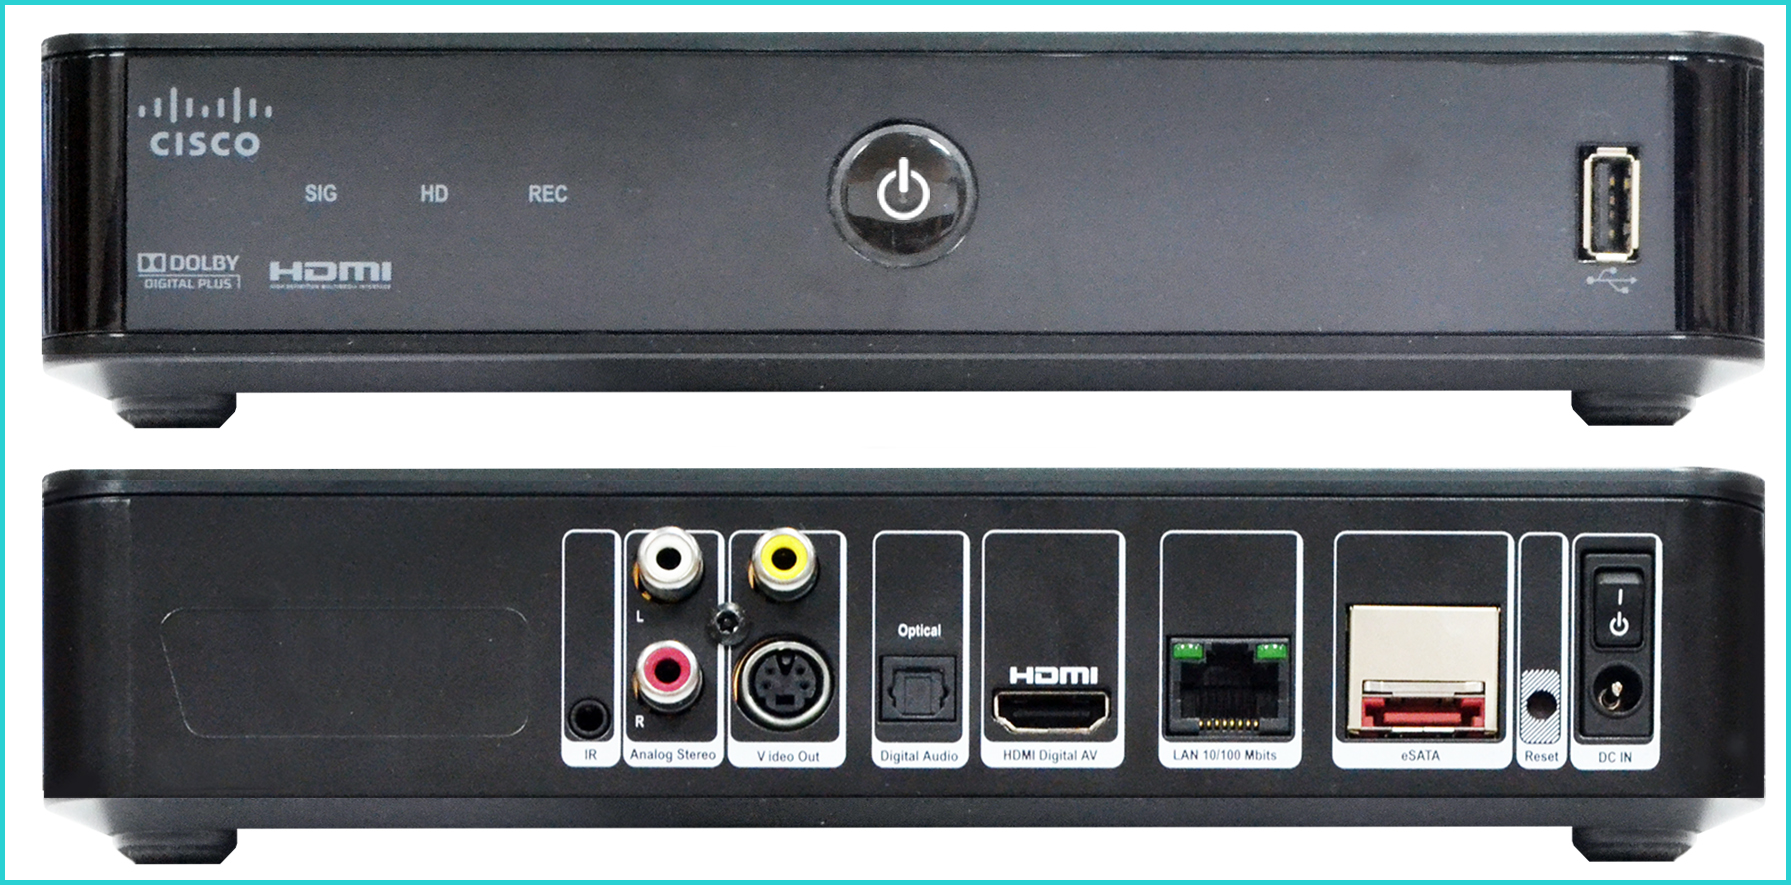 Rassmotrim-opisanie-razjomov-na-primere-rasprostranjonnoj-TV-pristavki-Cisco-2230.png